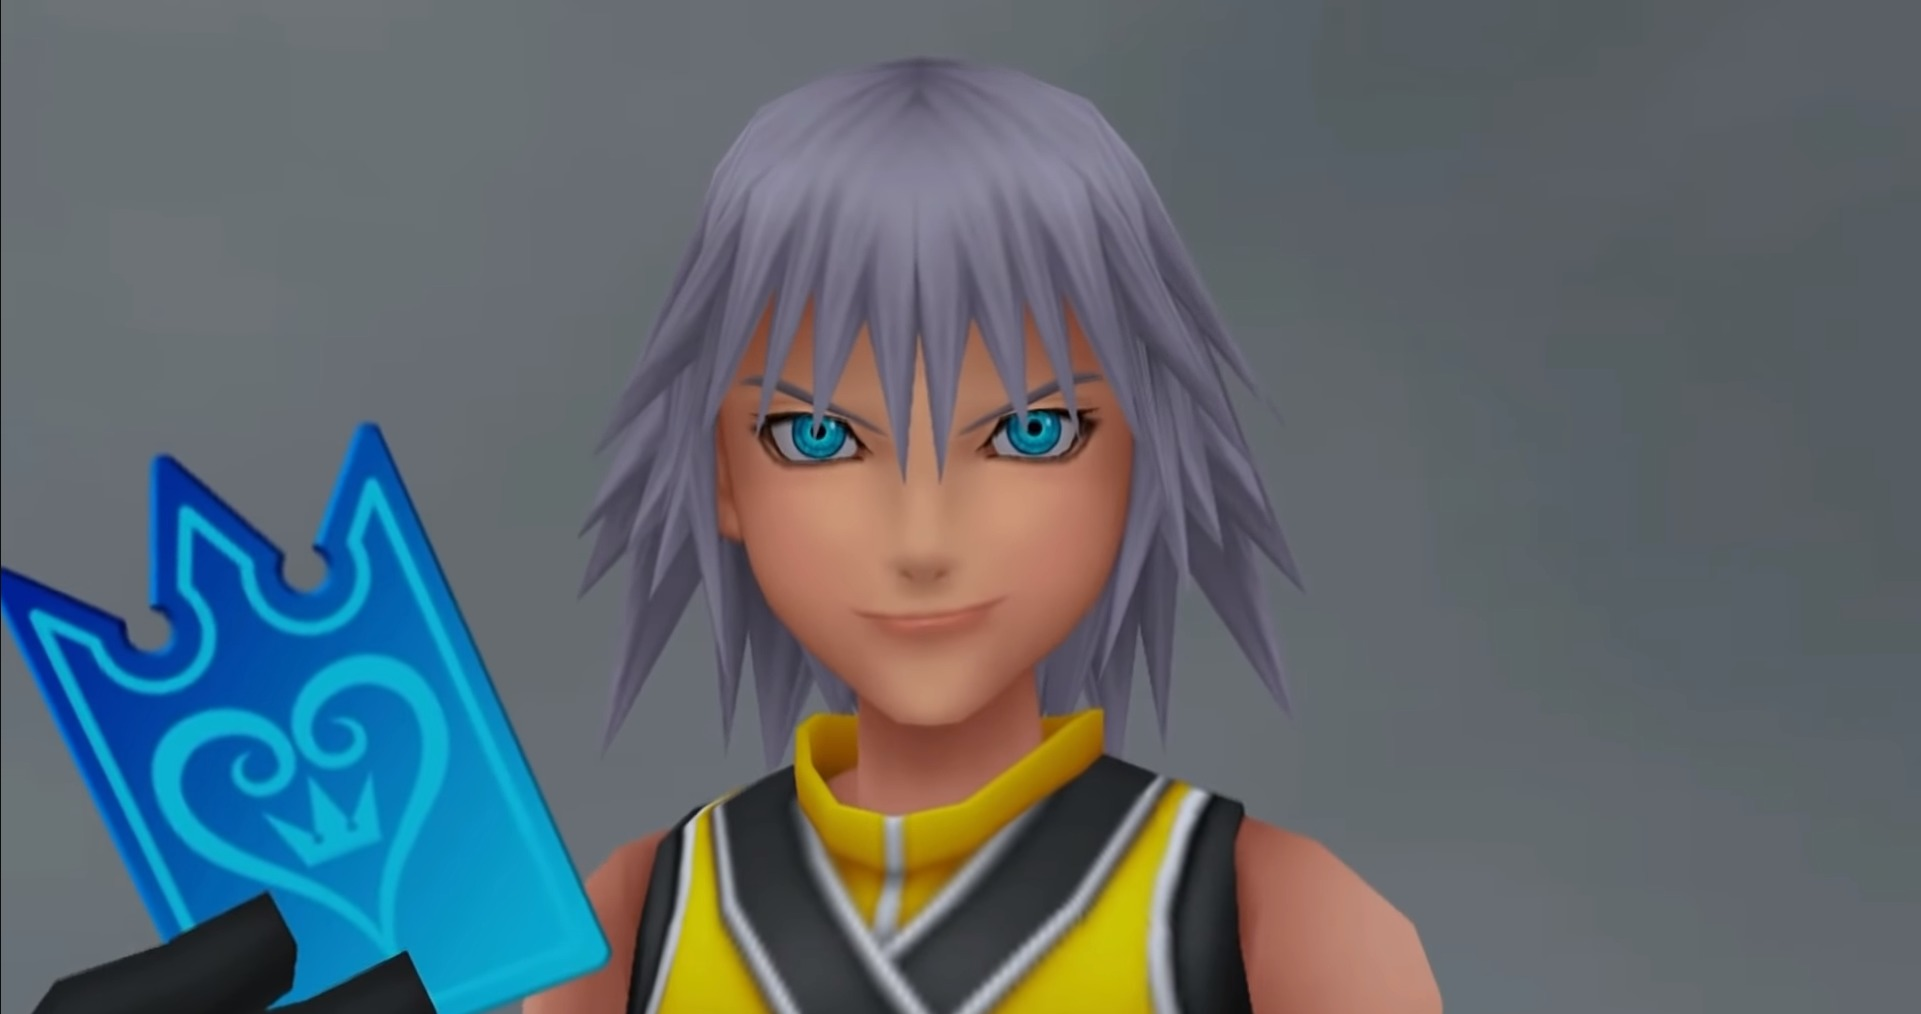 Riku tenant une carte